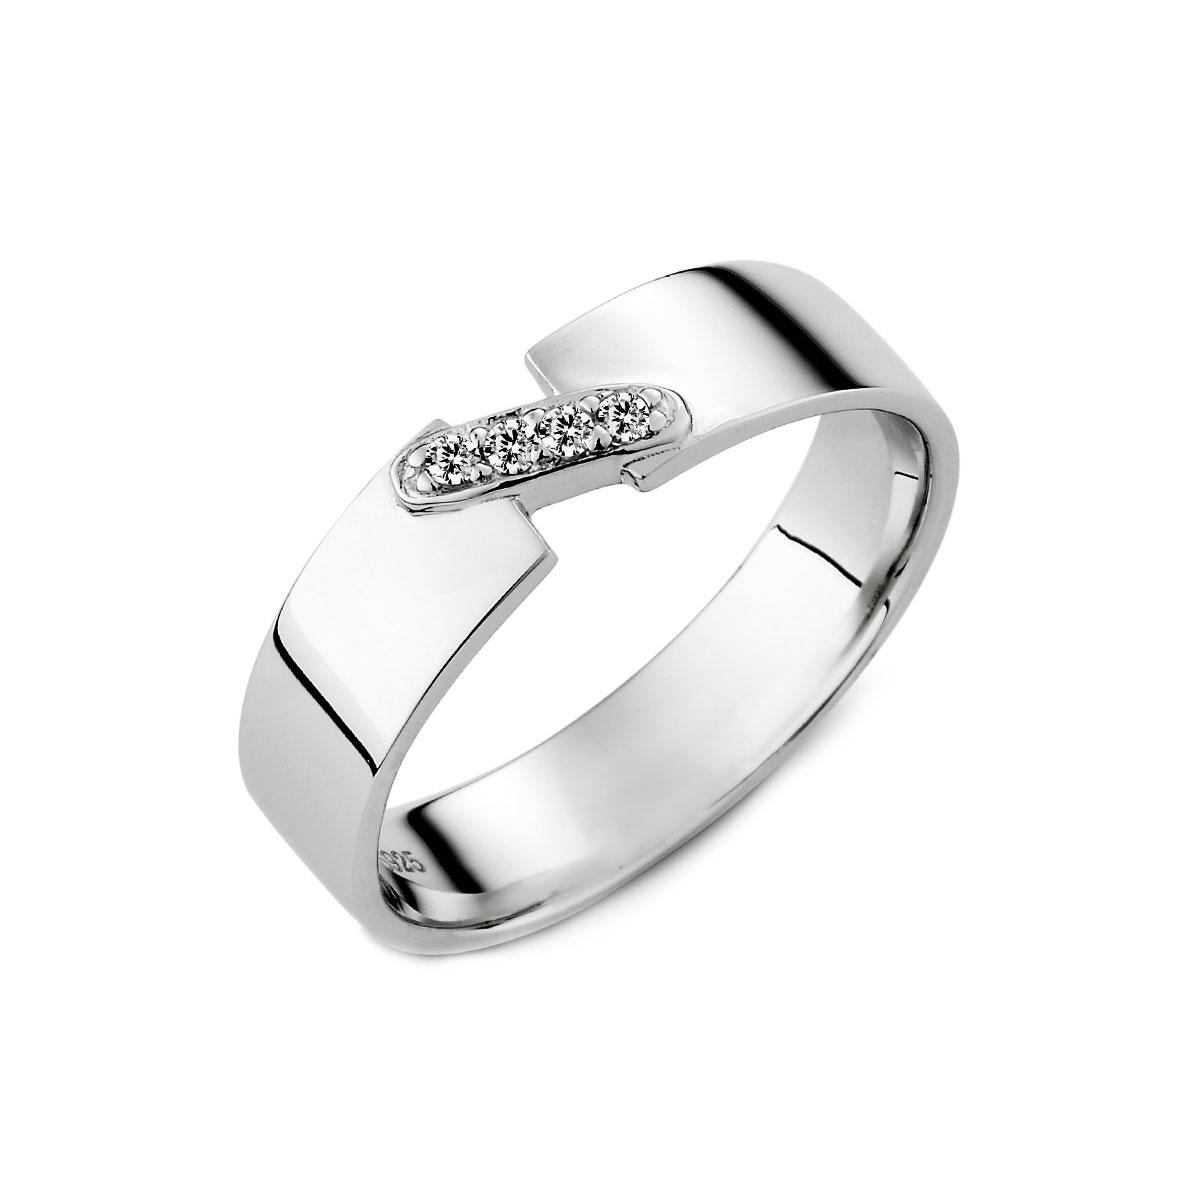 KSW266 銀色舞曲滿鑽戒指